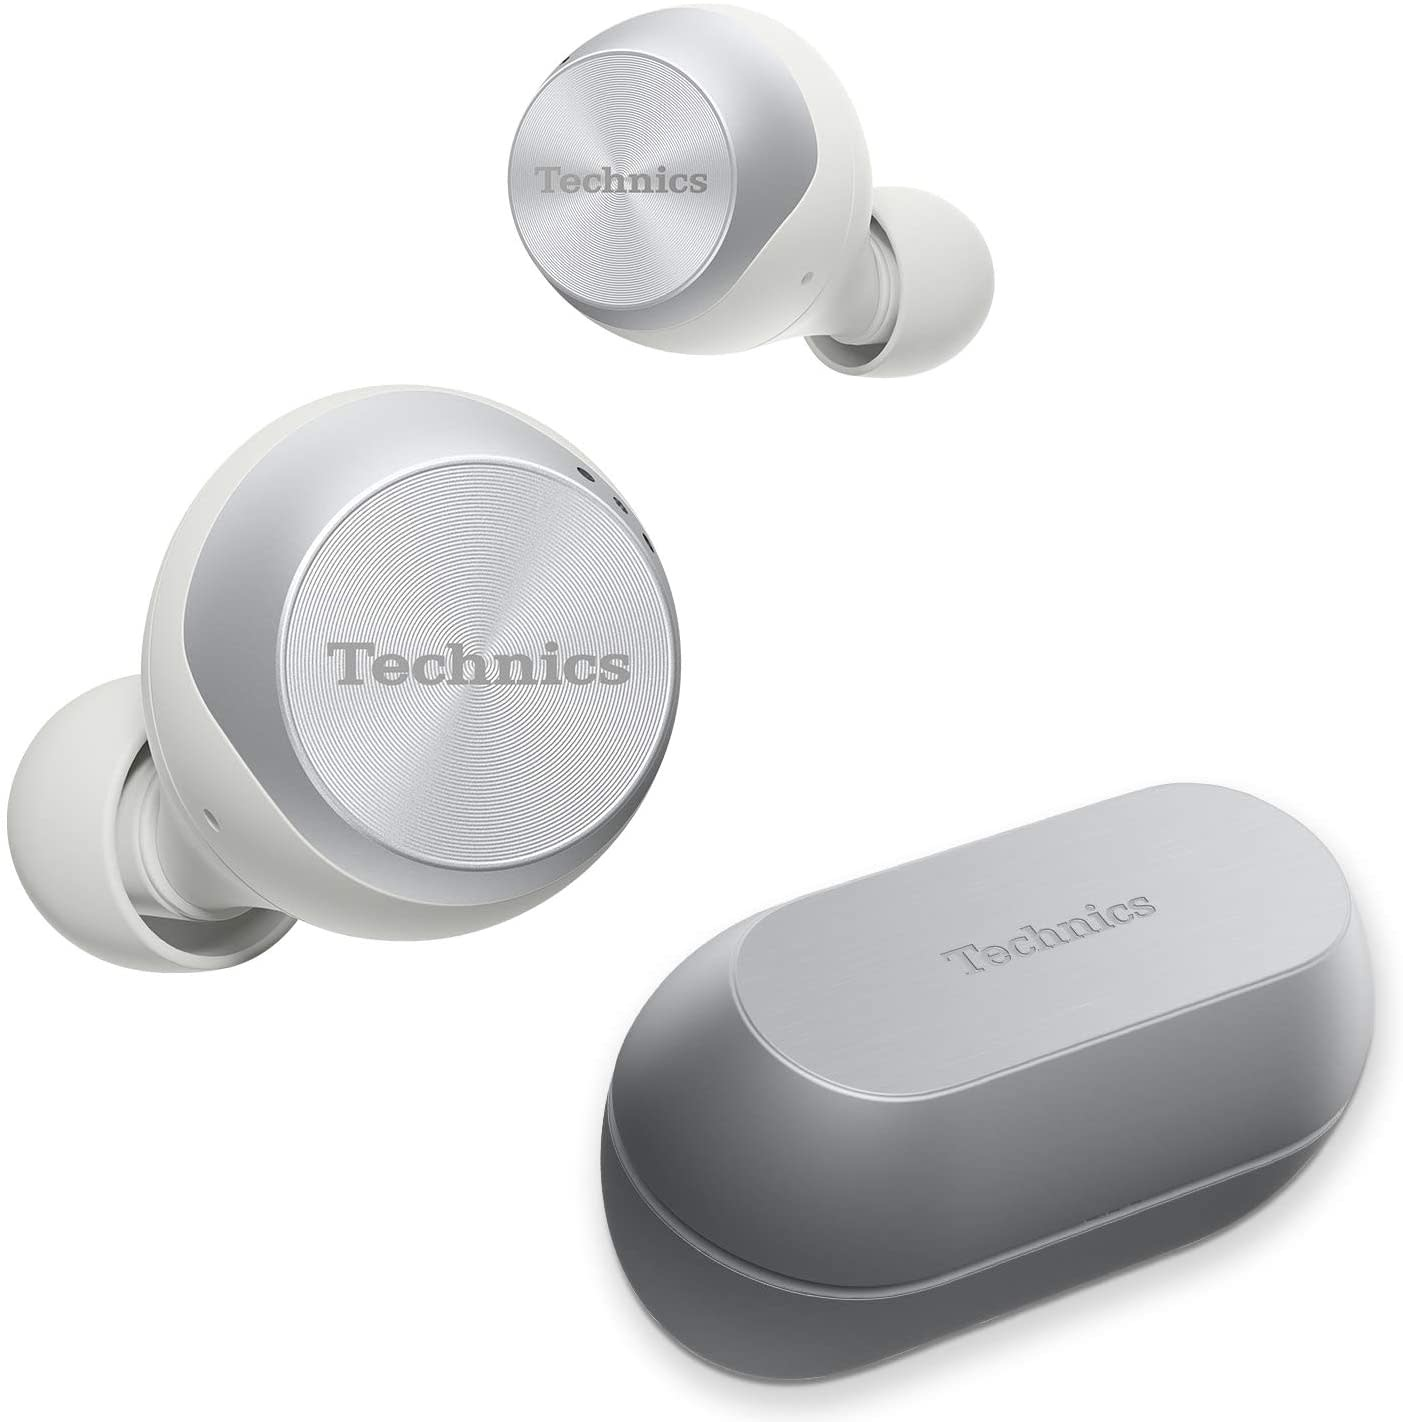 Technics Premium Noise Cancelling Wireless Headphones EAH-AZ70W